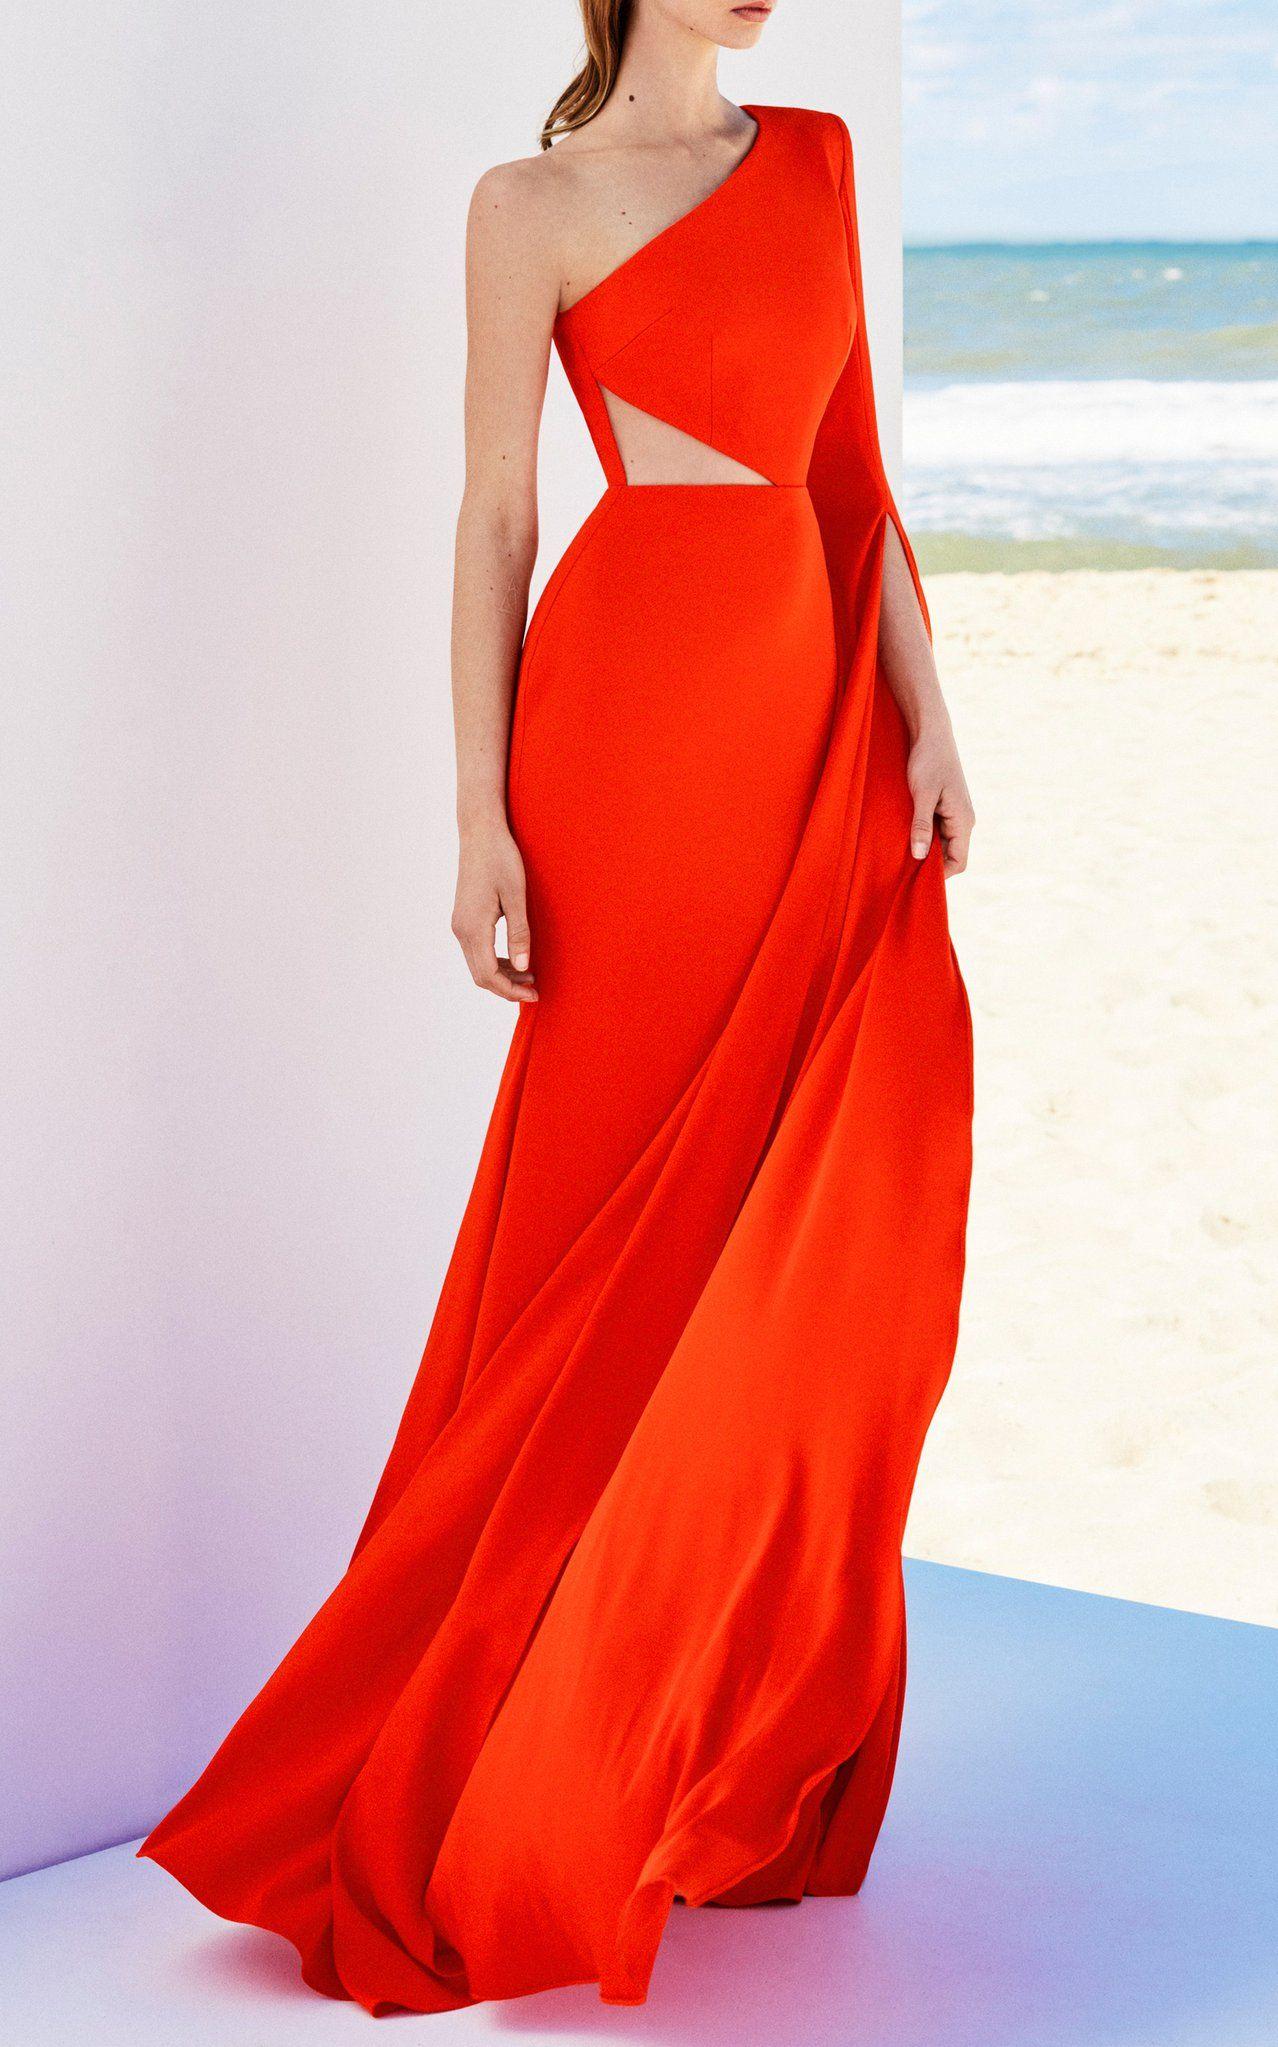 Zwangerschapskleding Gala.Ava Satin Crepe One Shoulder Sleeve Gown By Alex Perry Maximillia